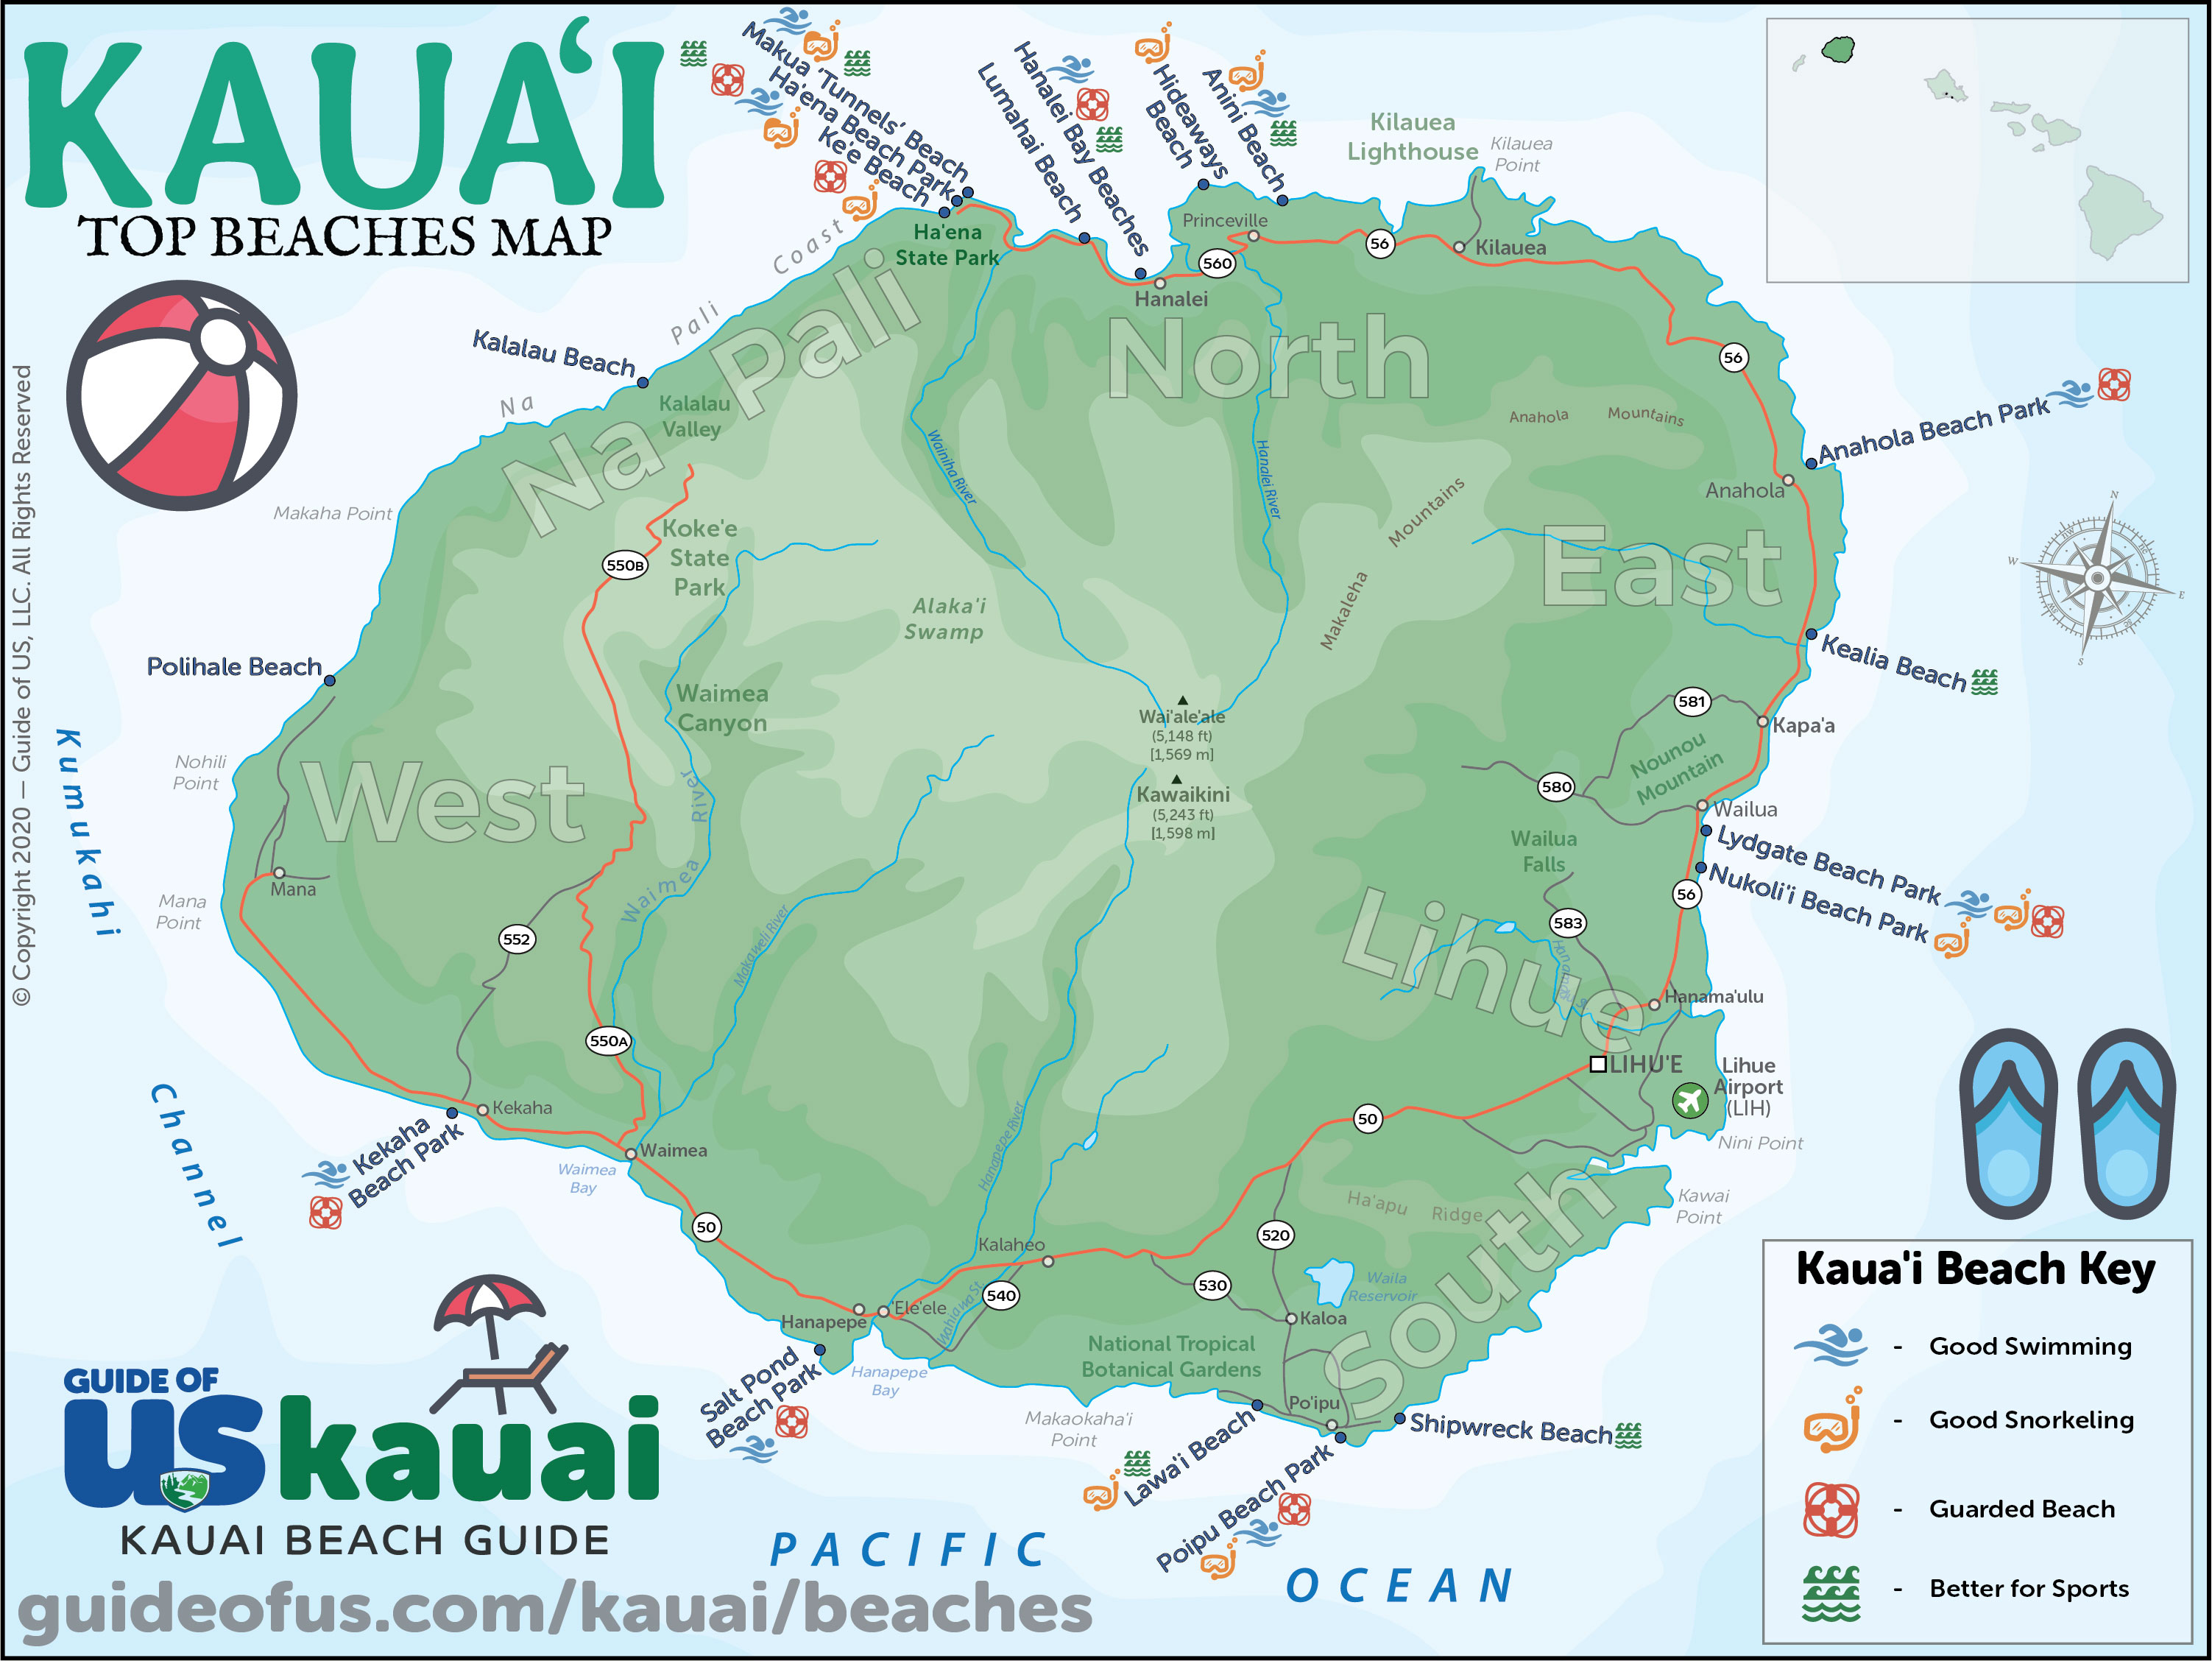 Top 10 Beaches On Kauai Best Of Kauai Beach Map